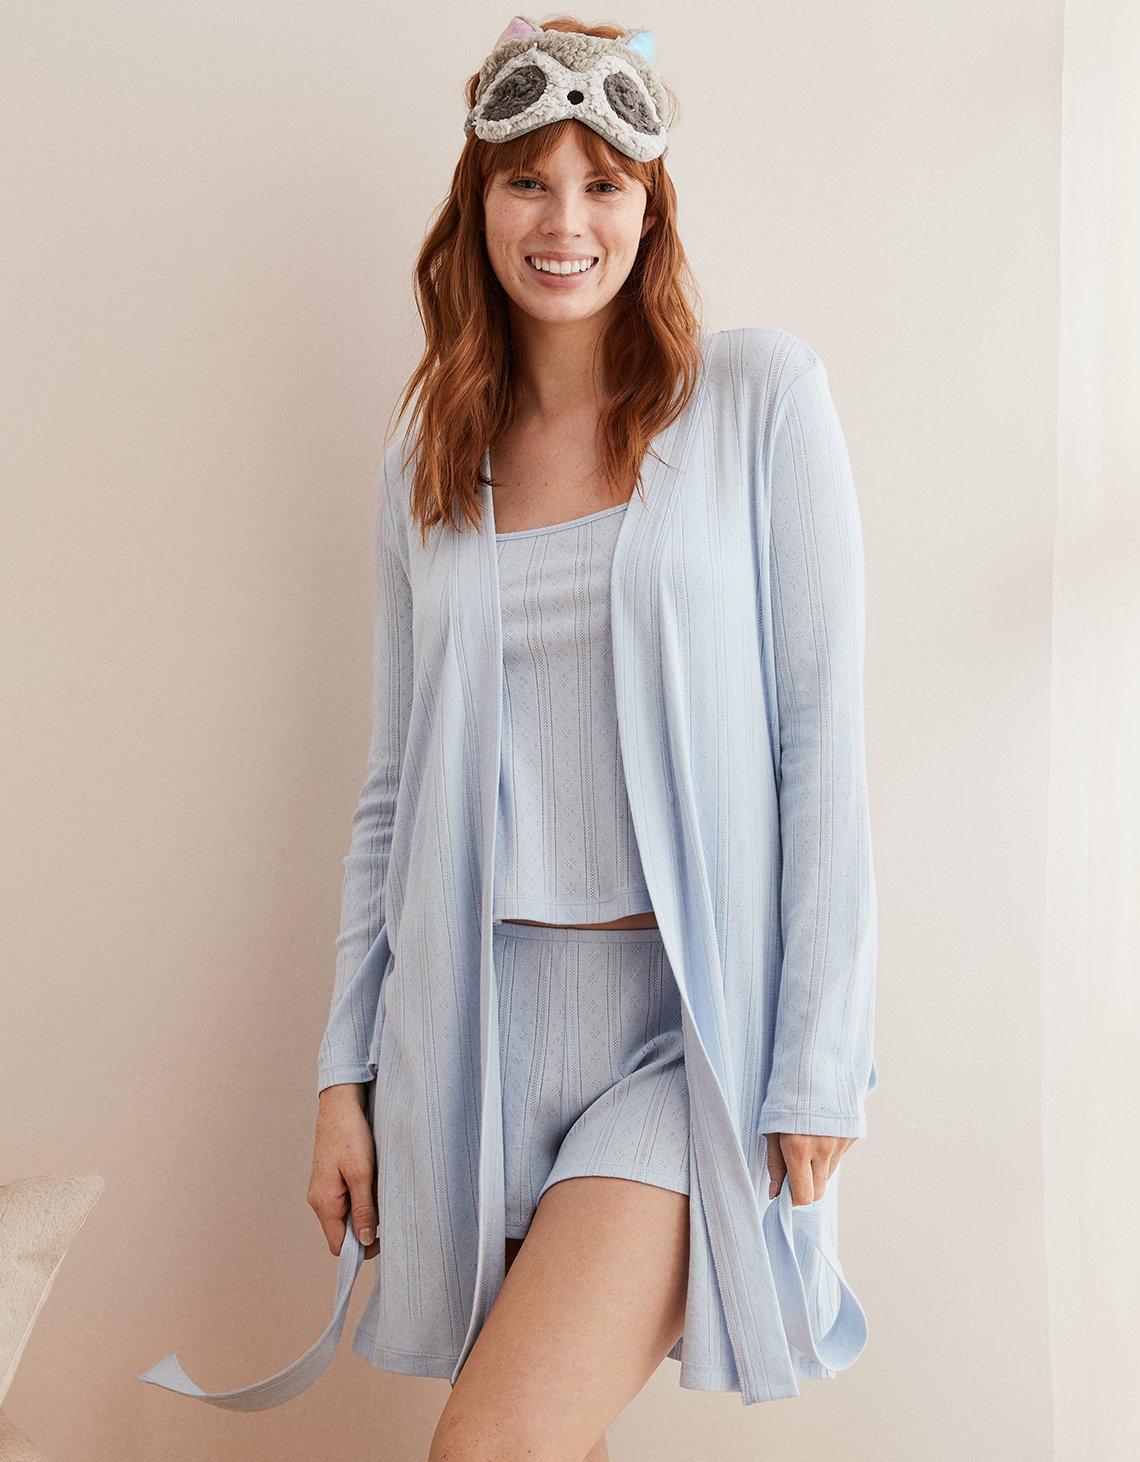 a99f93bb1f4 Dreams Co Hooded Fleece Sweatshirt Robe